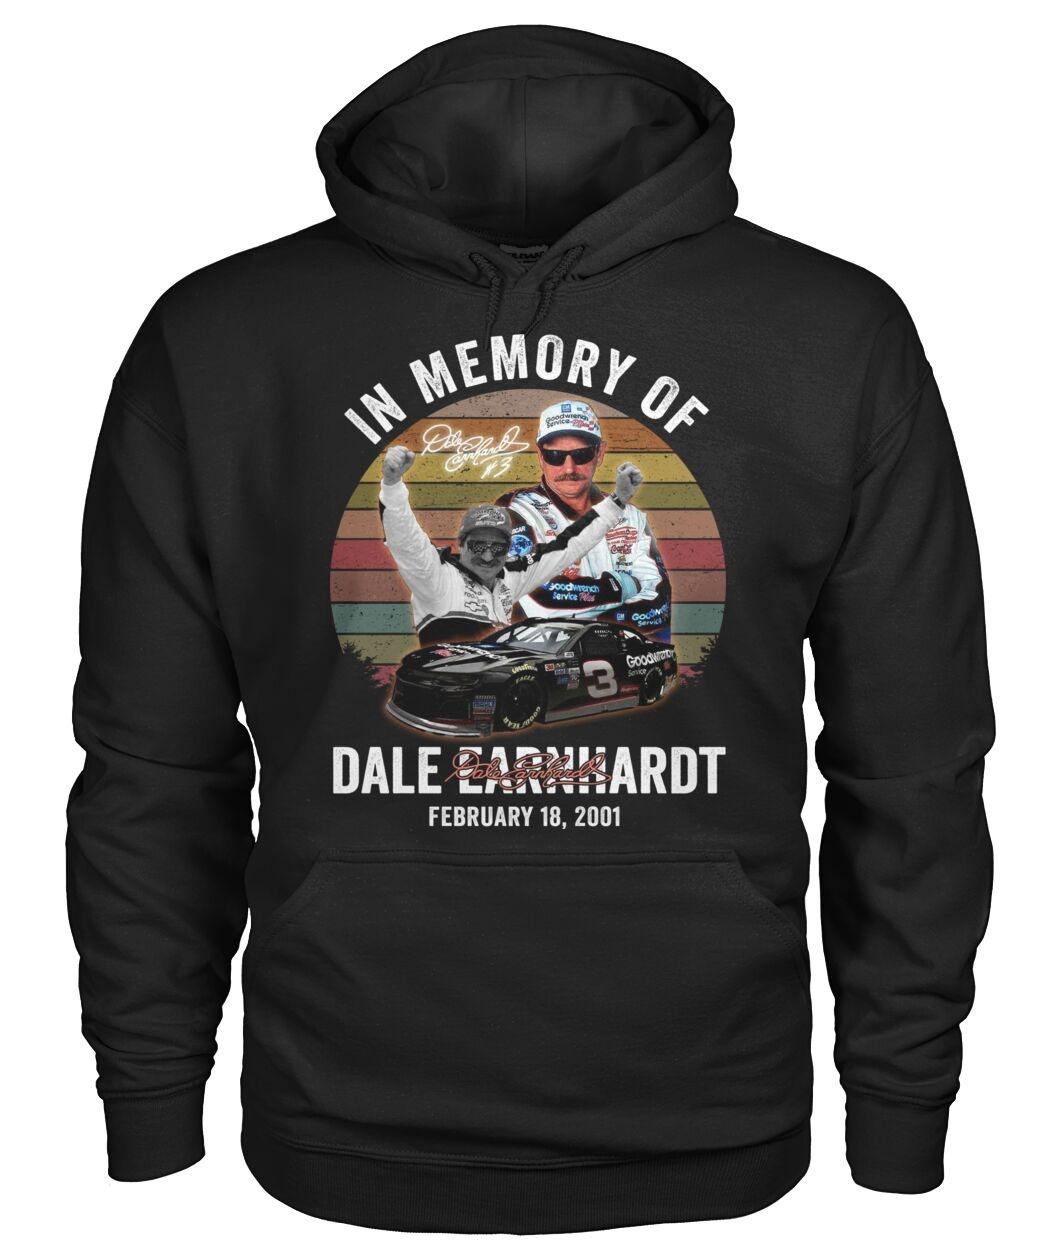 In Memory Of Dale Earnhardt February 18 2001 Hoodie